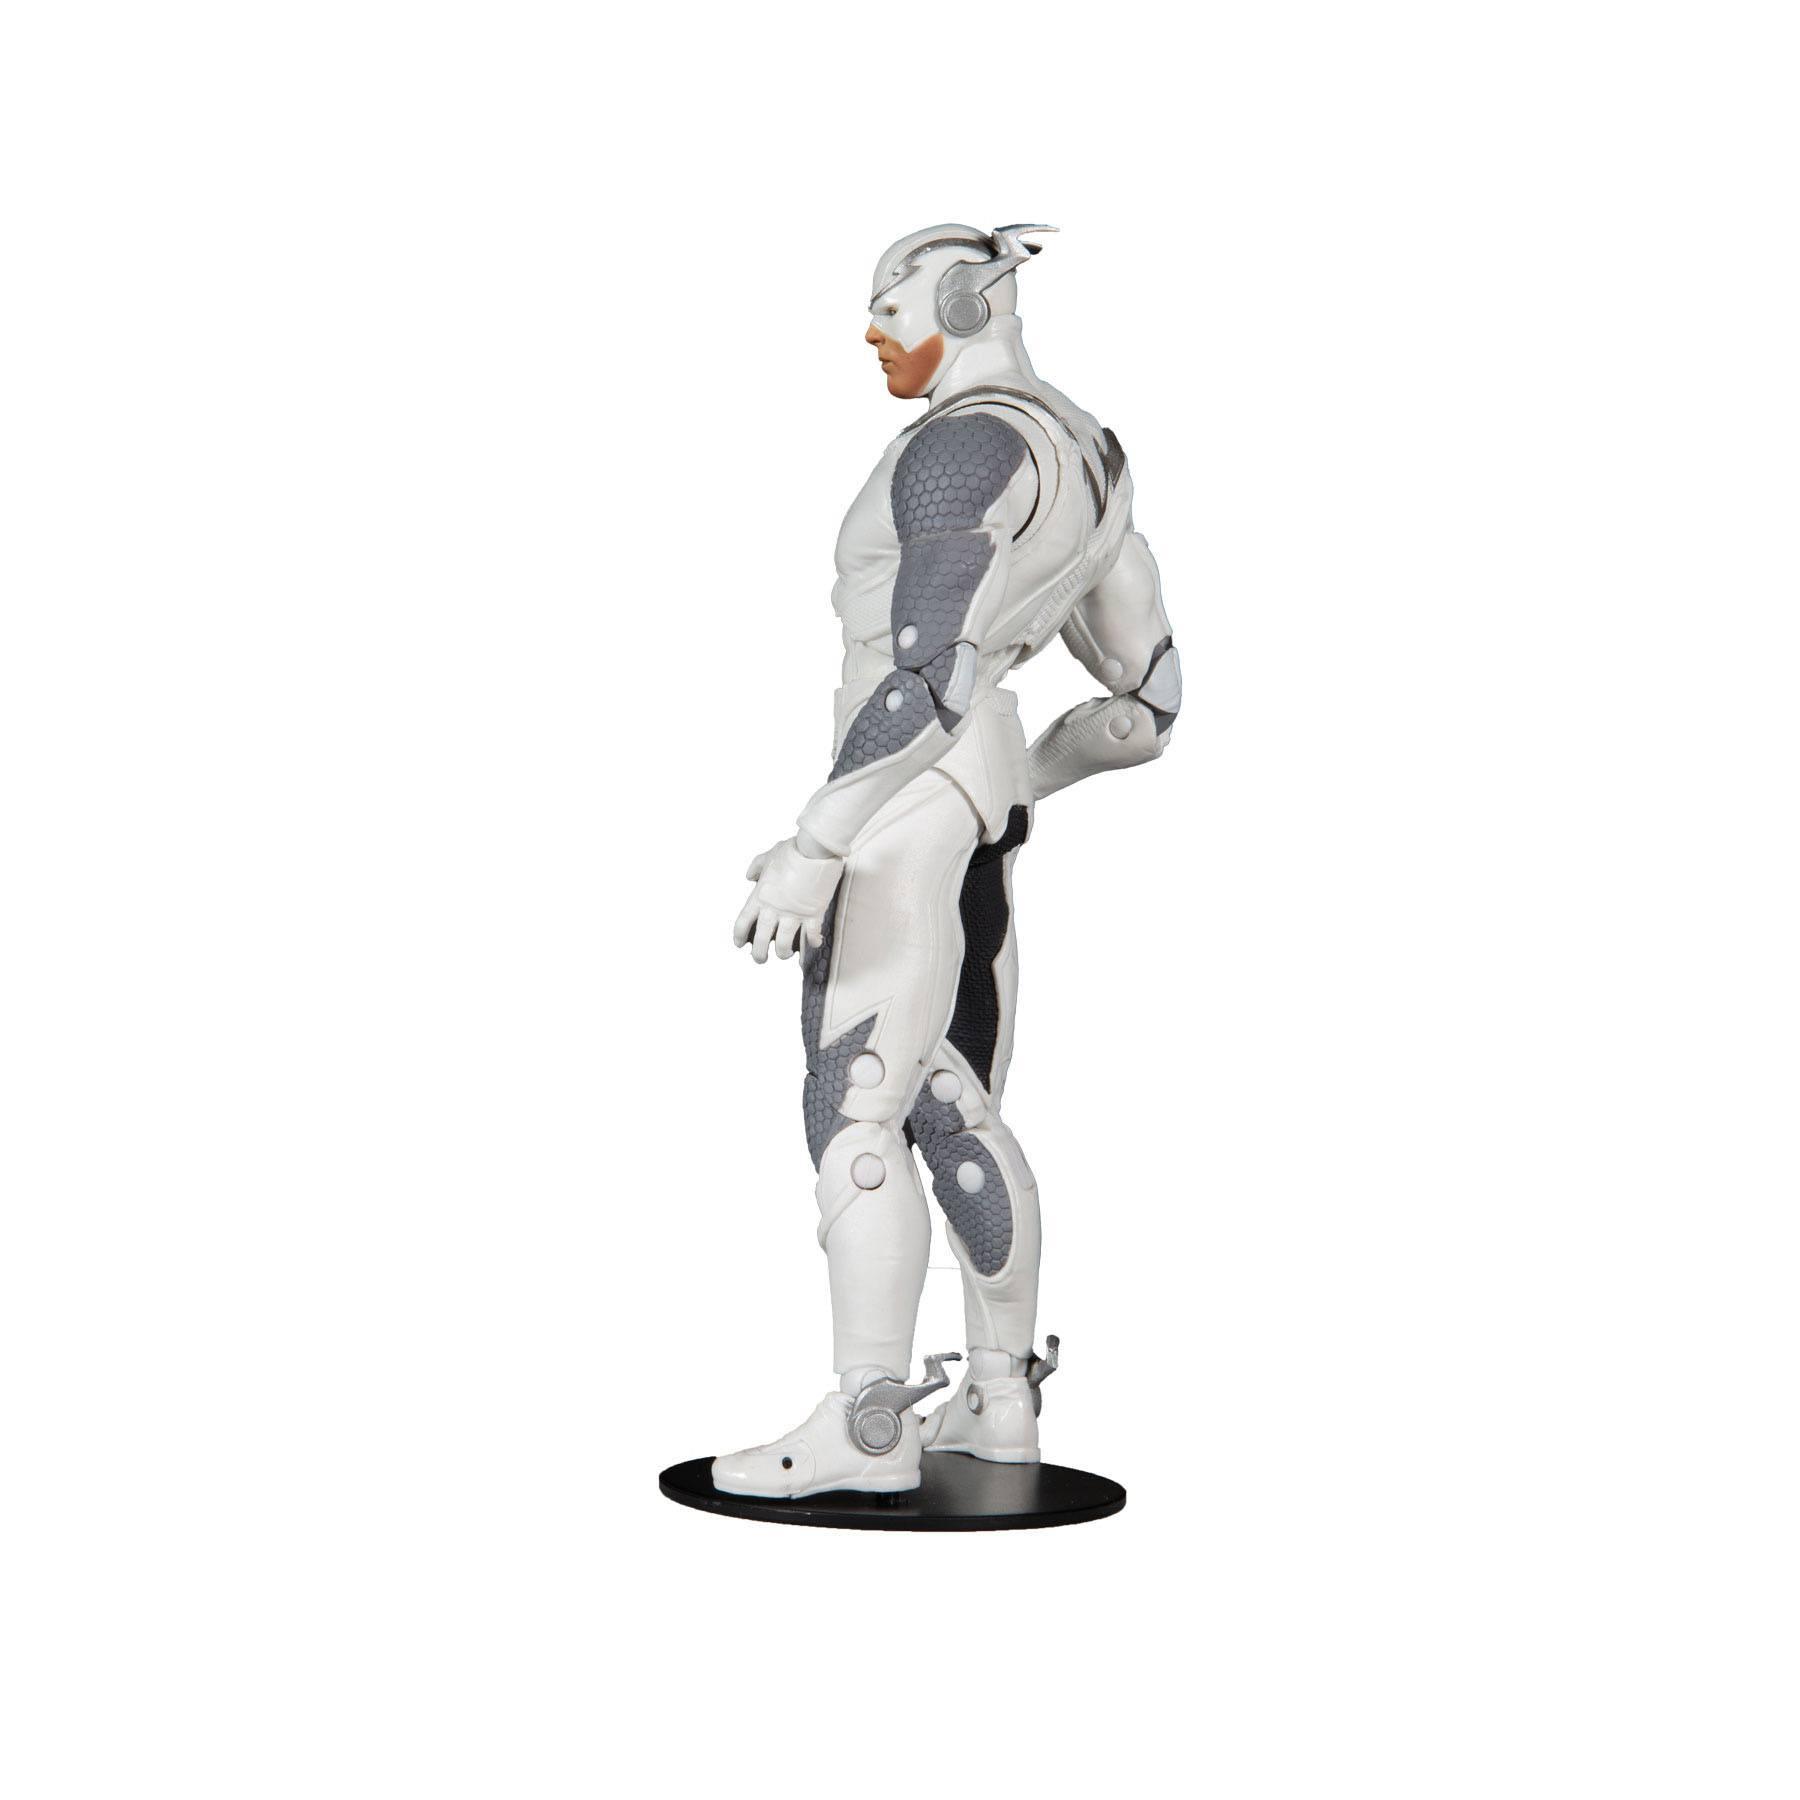 DC Gaming Actionfigur The Flash (Hot Pursuit) 18 cm MCF15374 787926153743